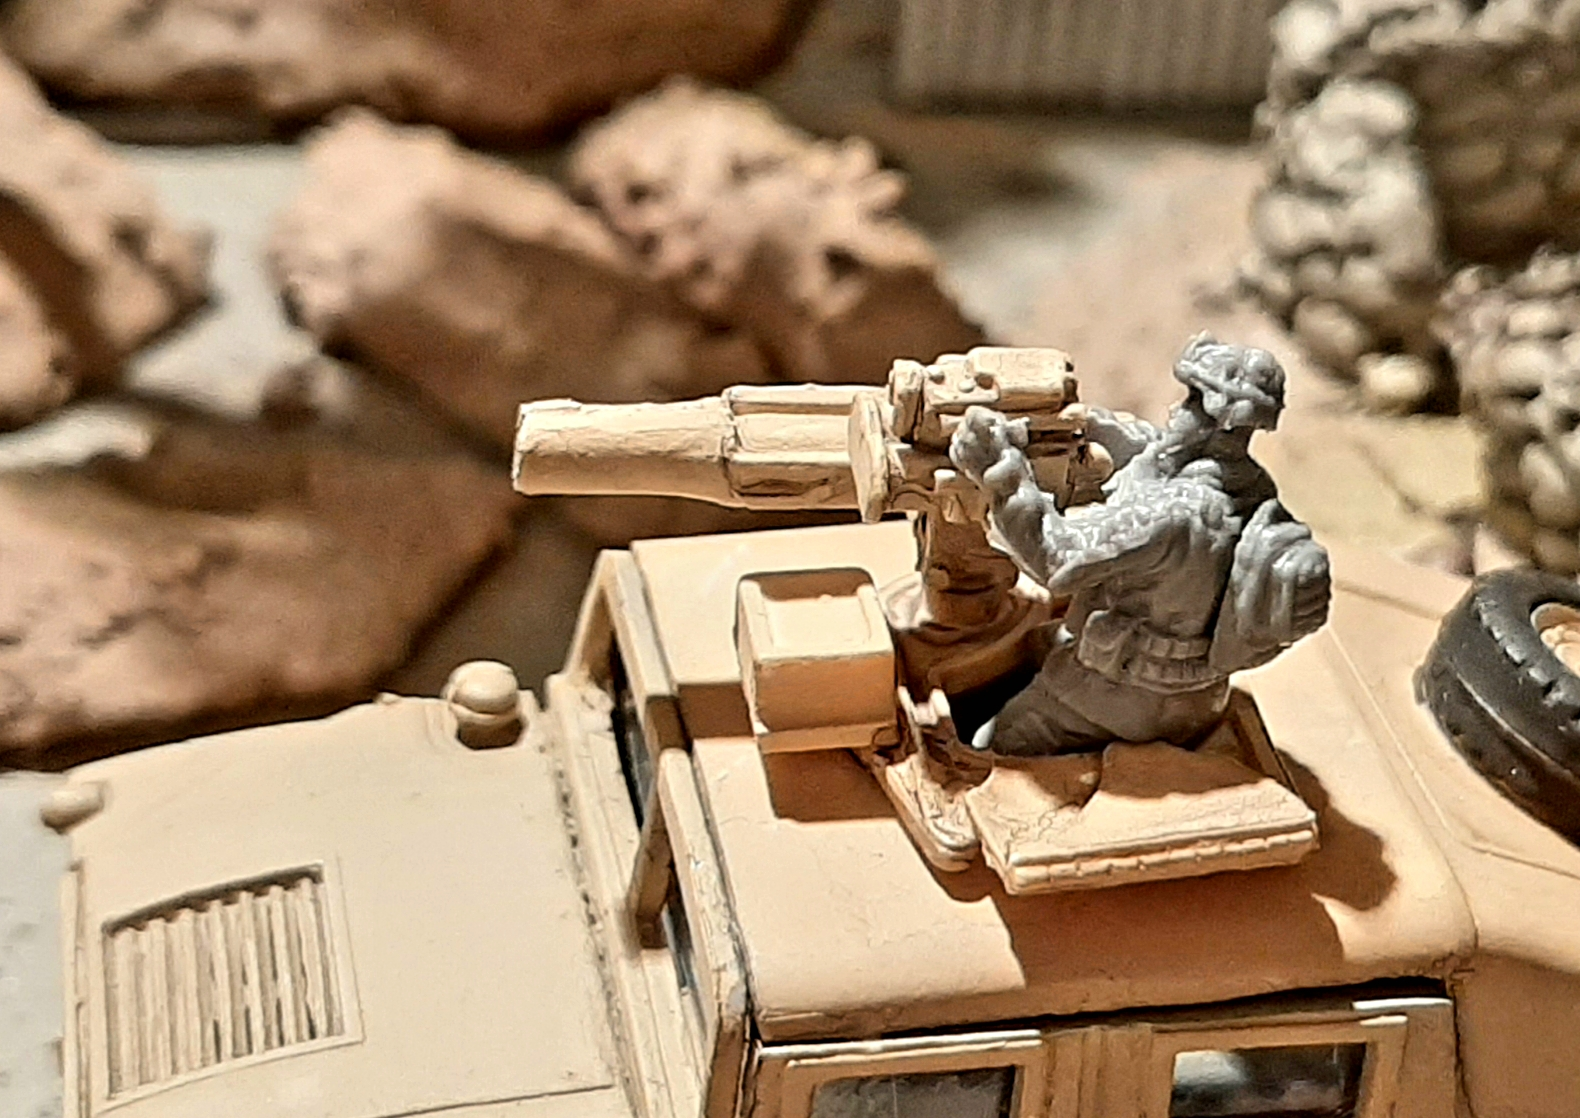 Diorama/Wargame Afghanistan 1/72 Rt2RvZP8